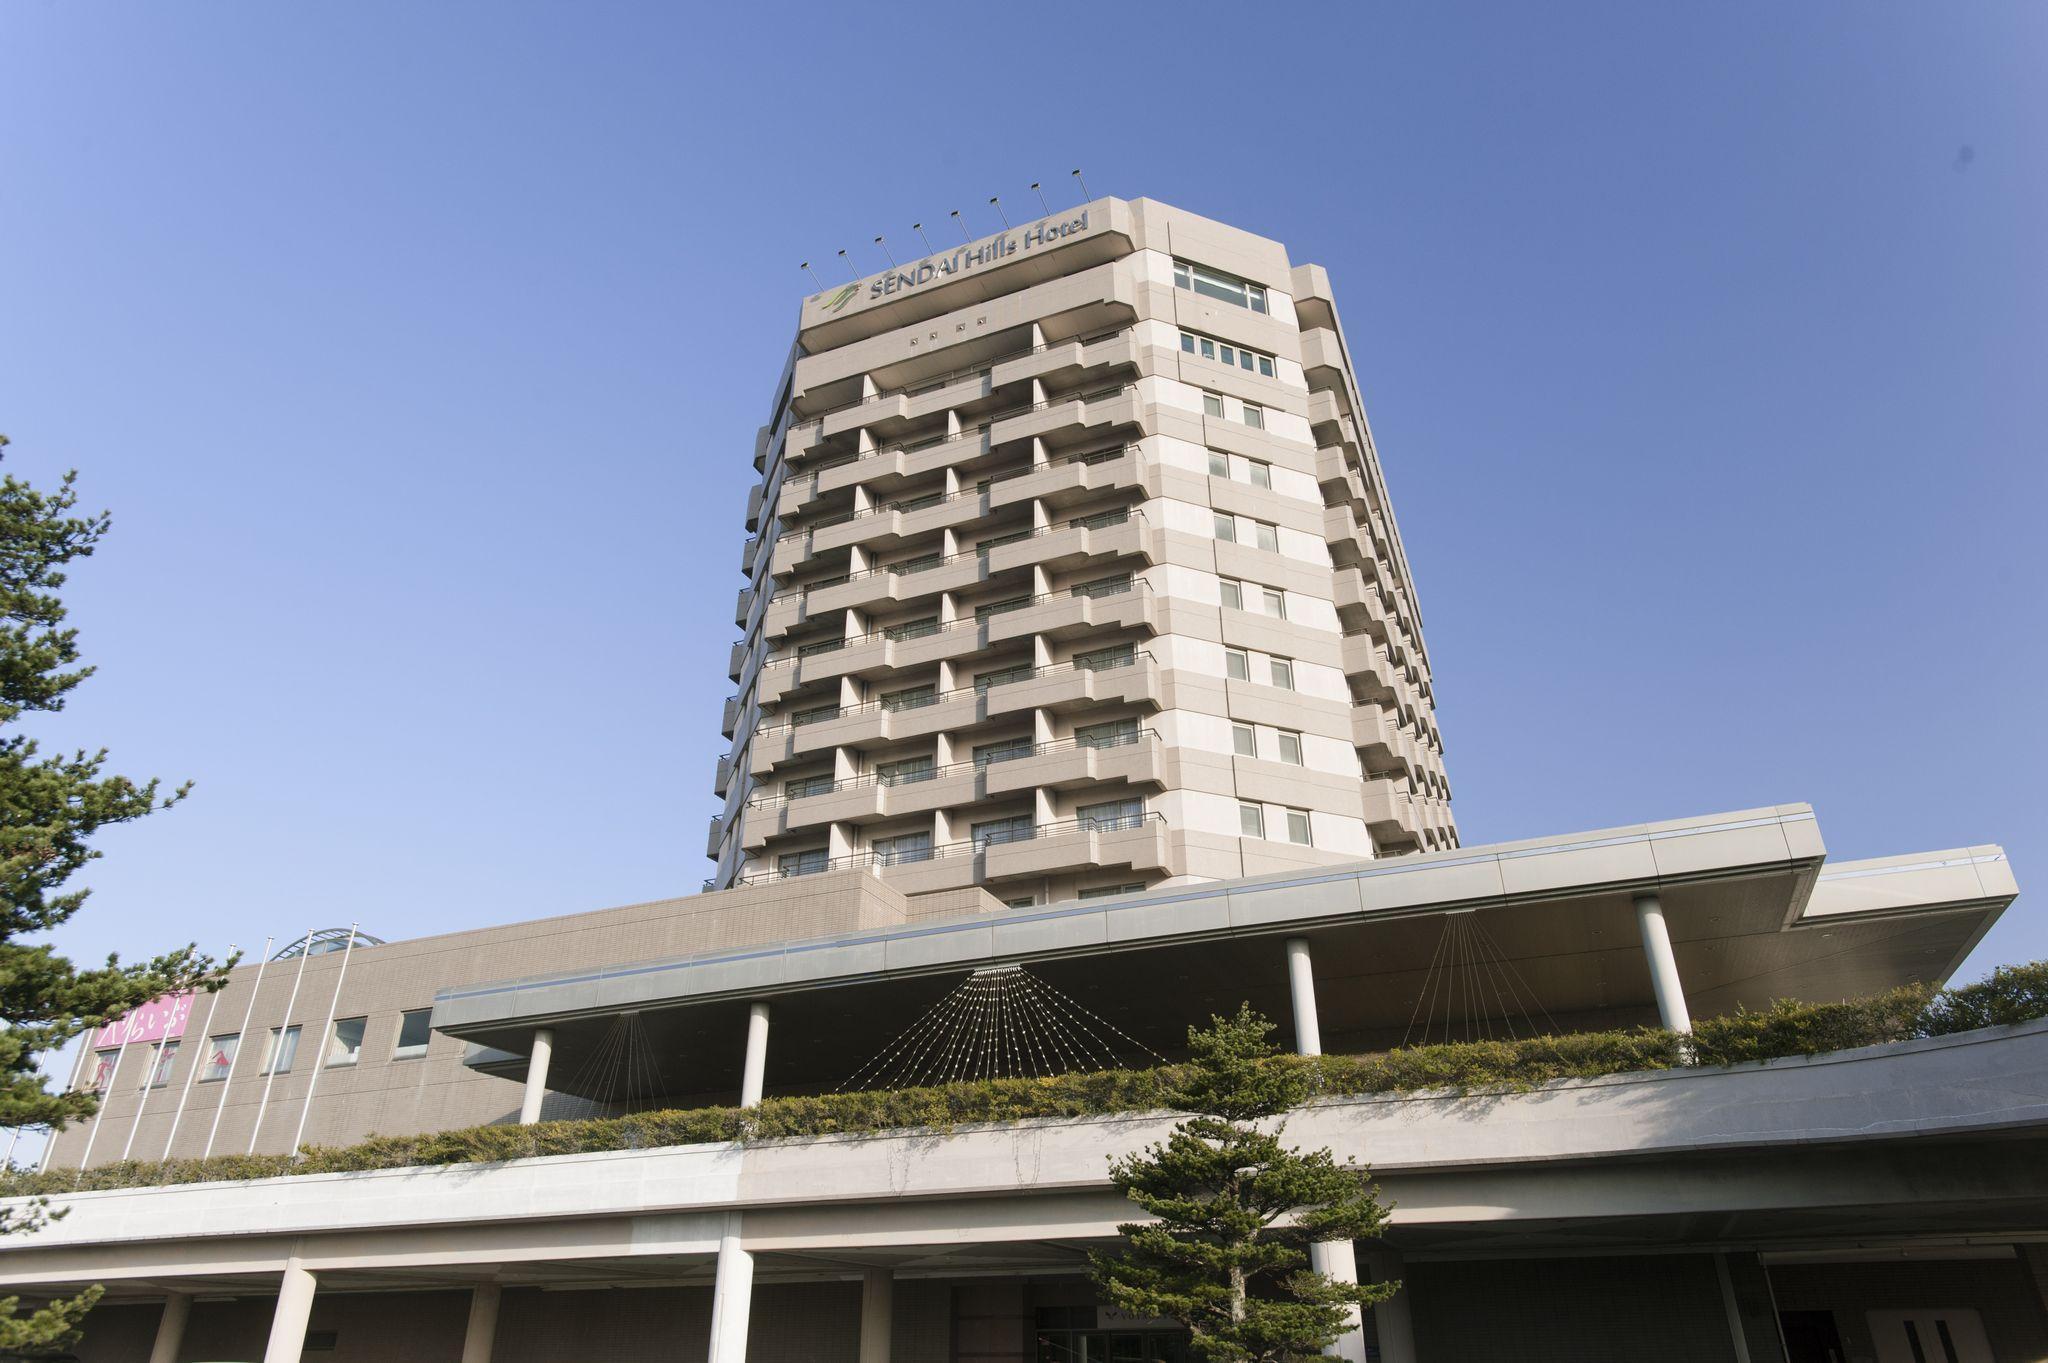 Sendai Hills Hotel